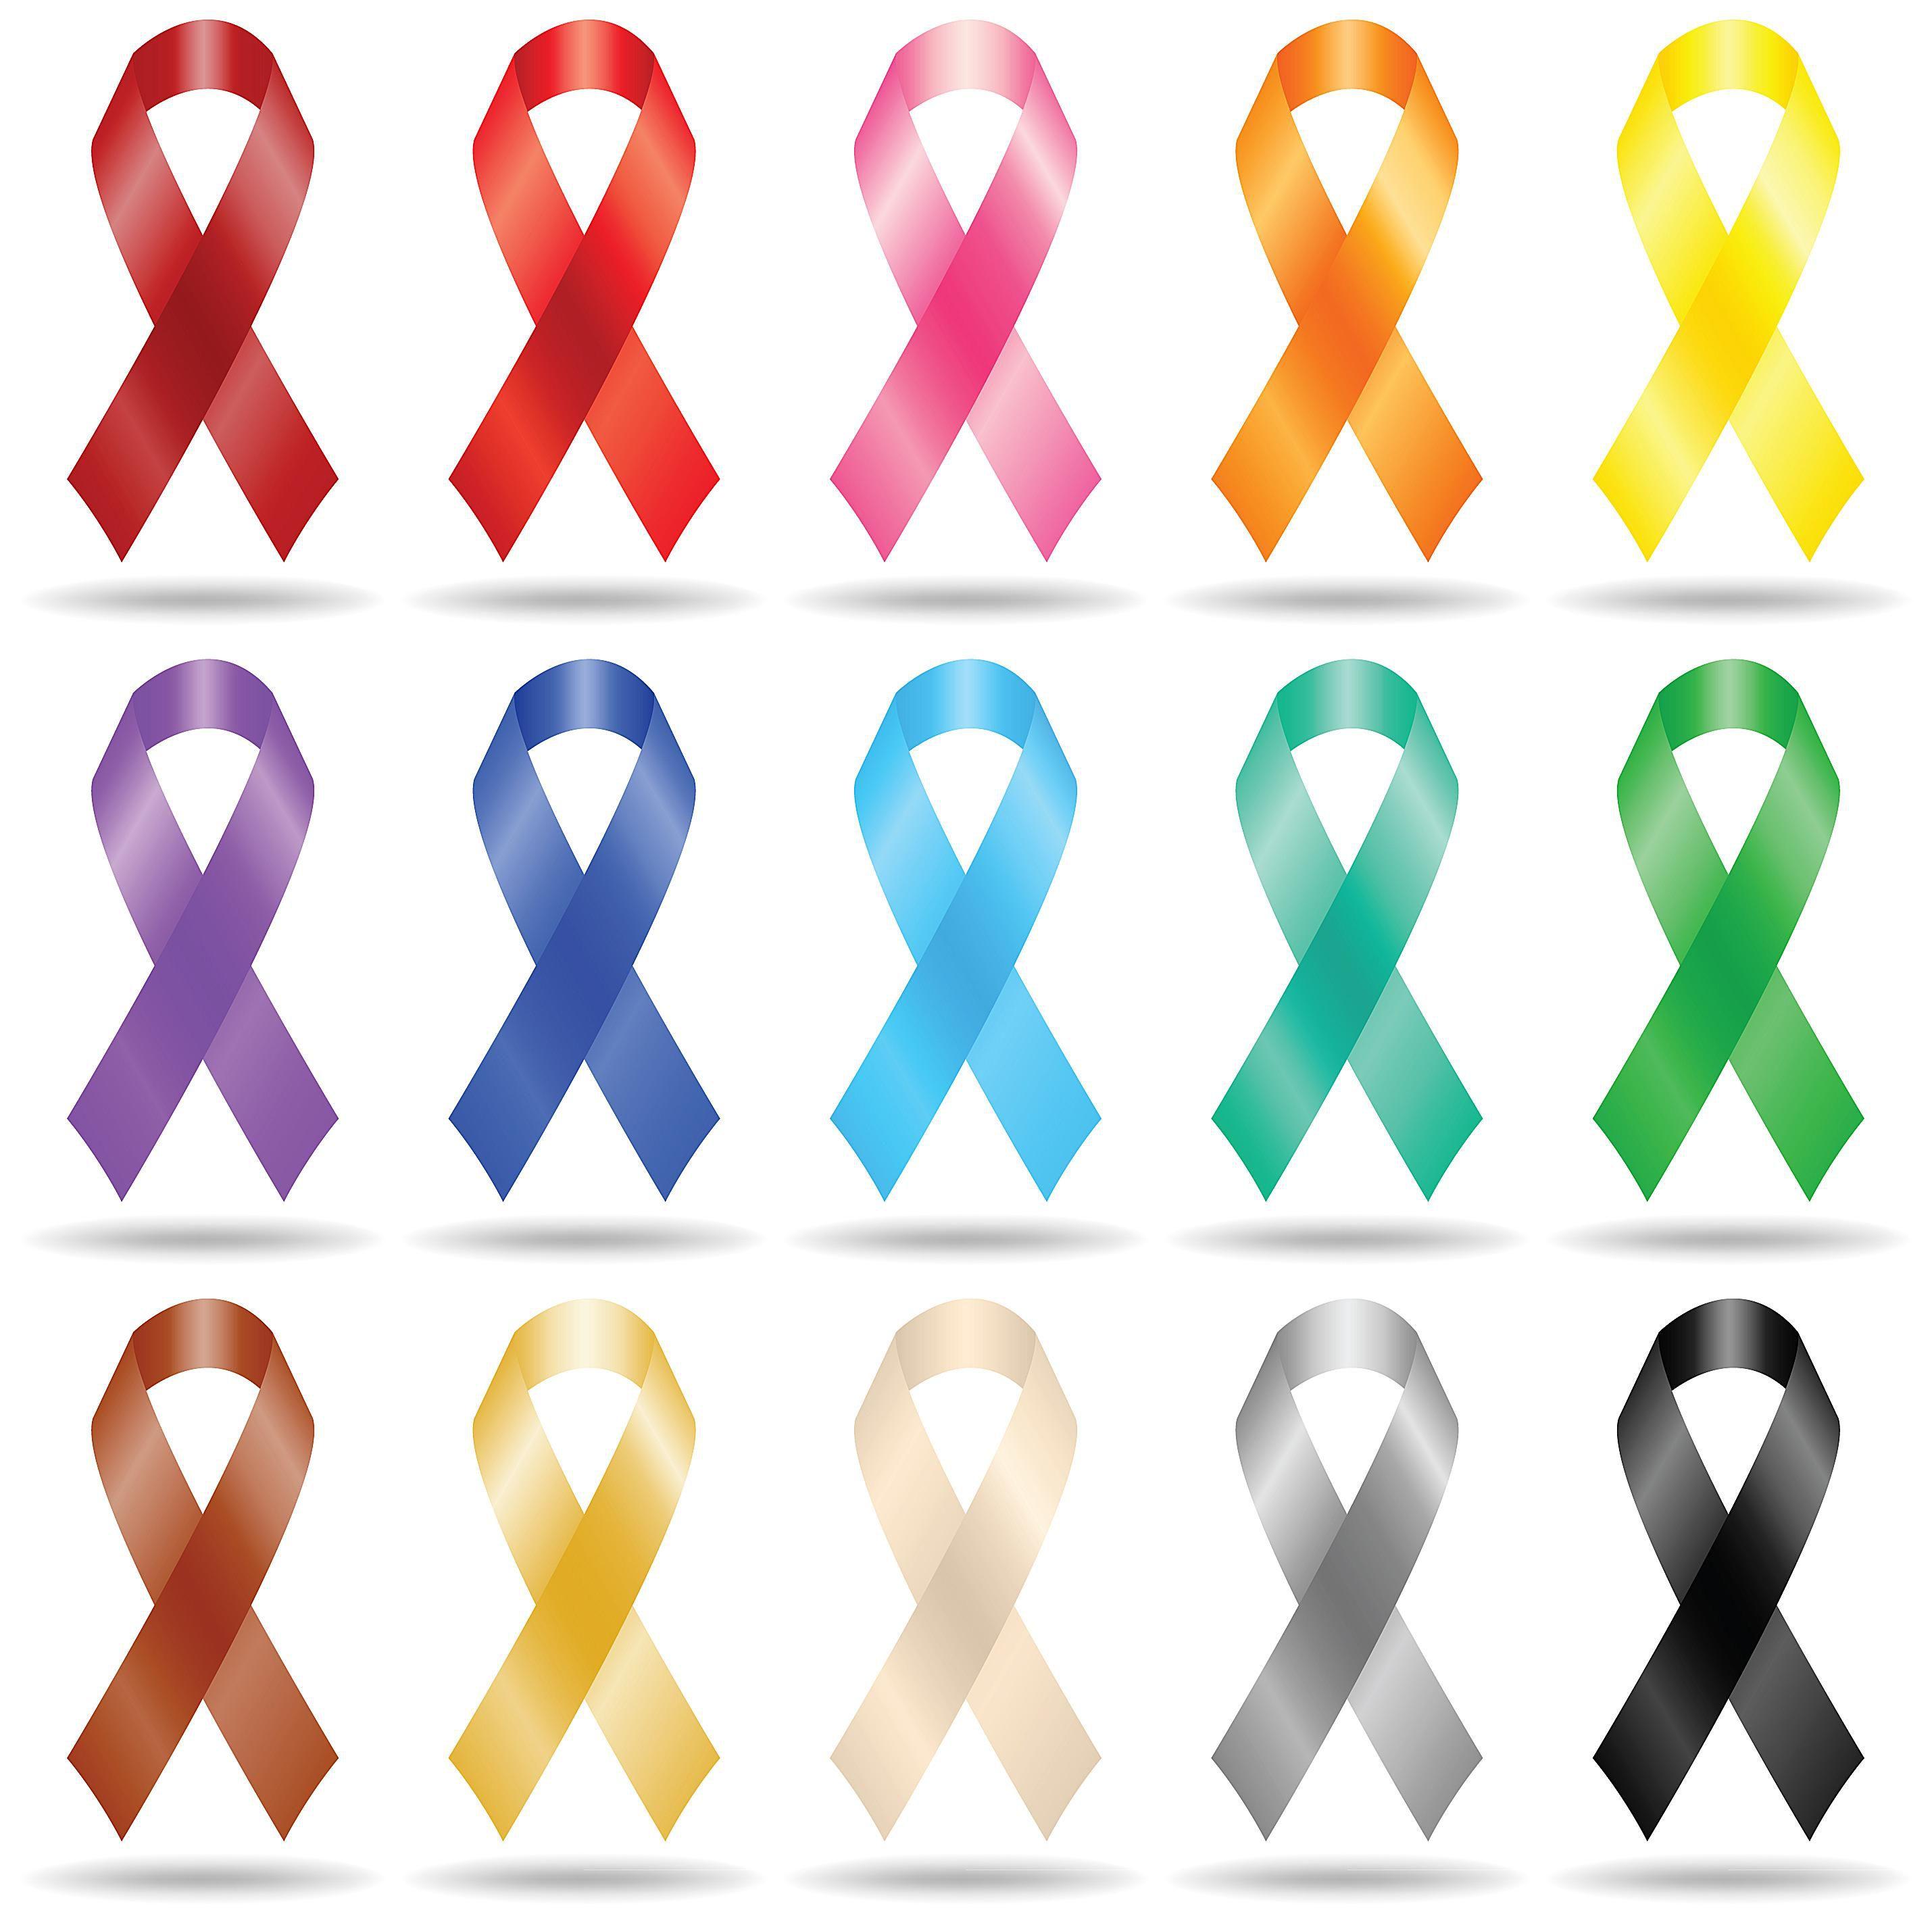 abdominal cancer color